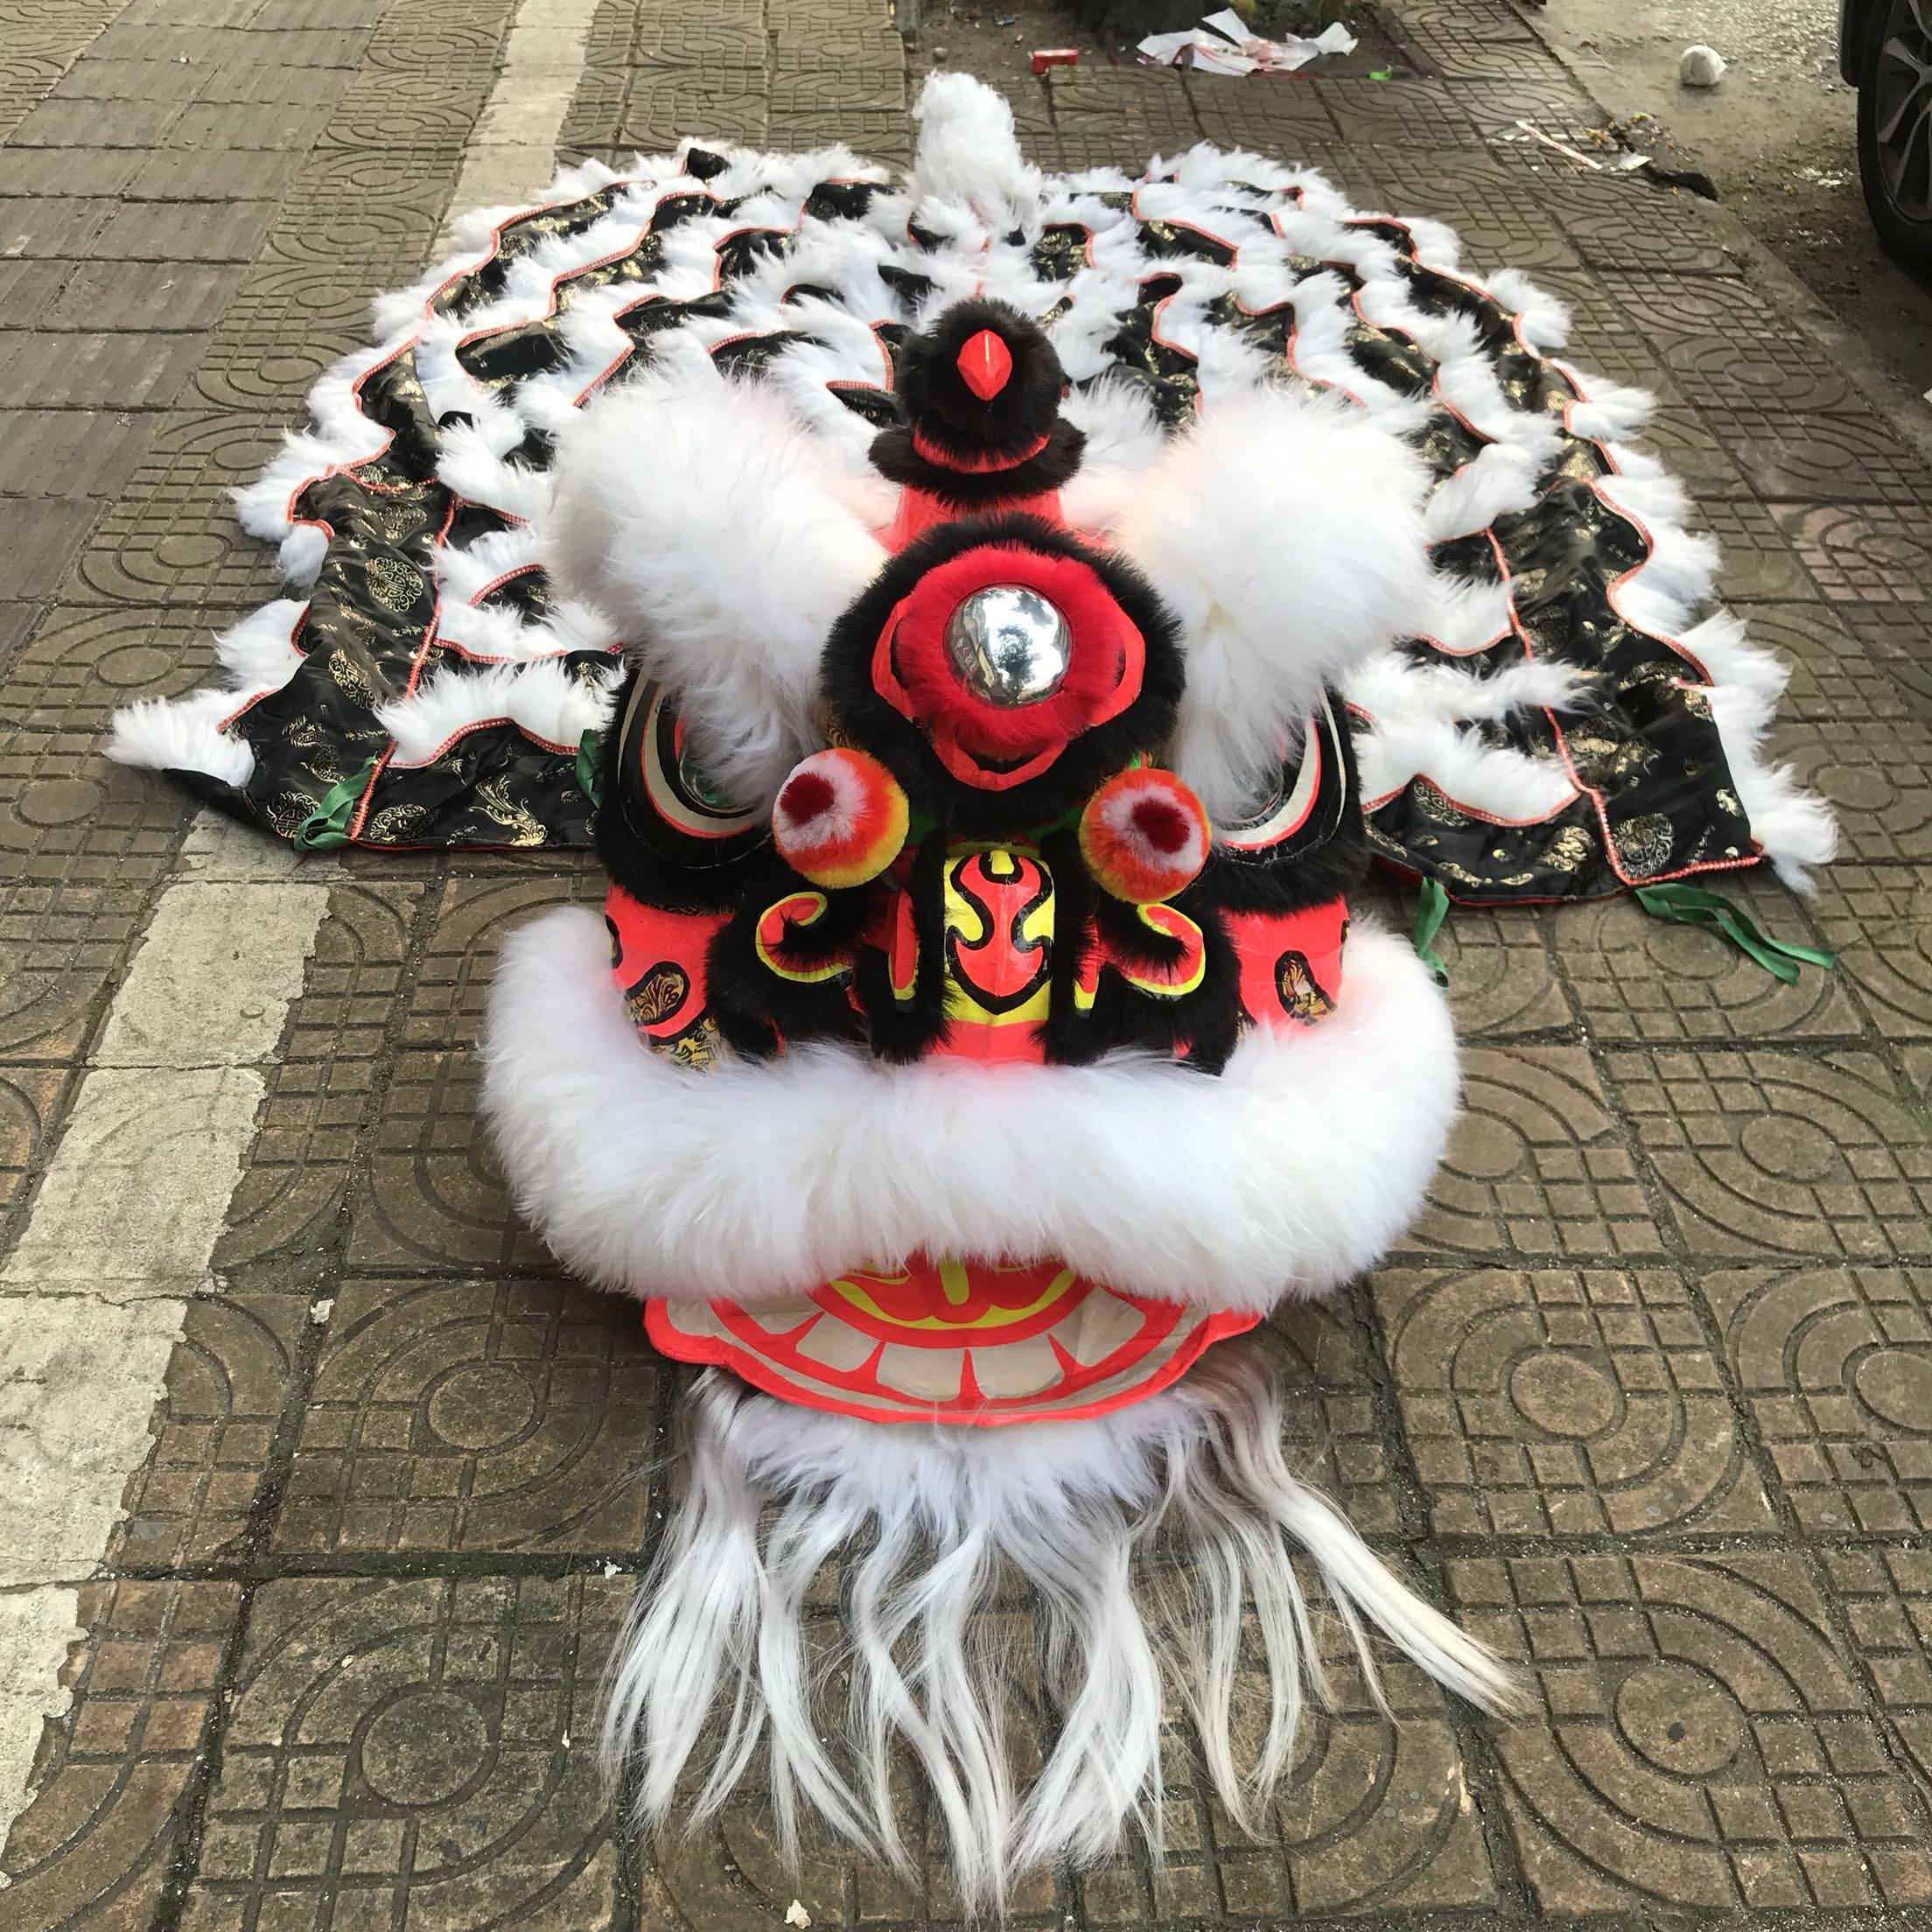 New Foshan Australian Wool Lion Dance MASCOT Costume Wool Chinese Folk Art Southern Two Adults Apparel Cartoon Character Clothes